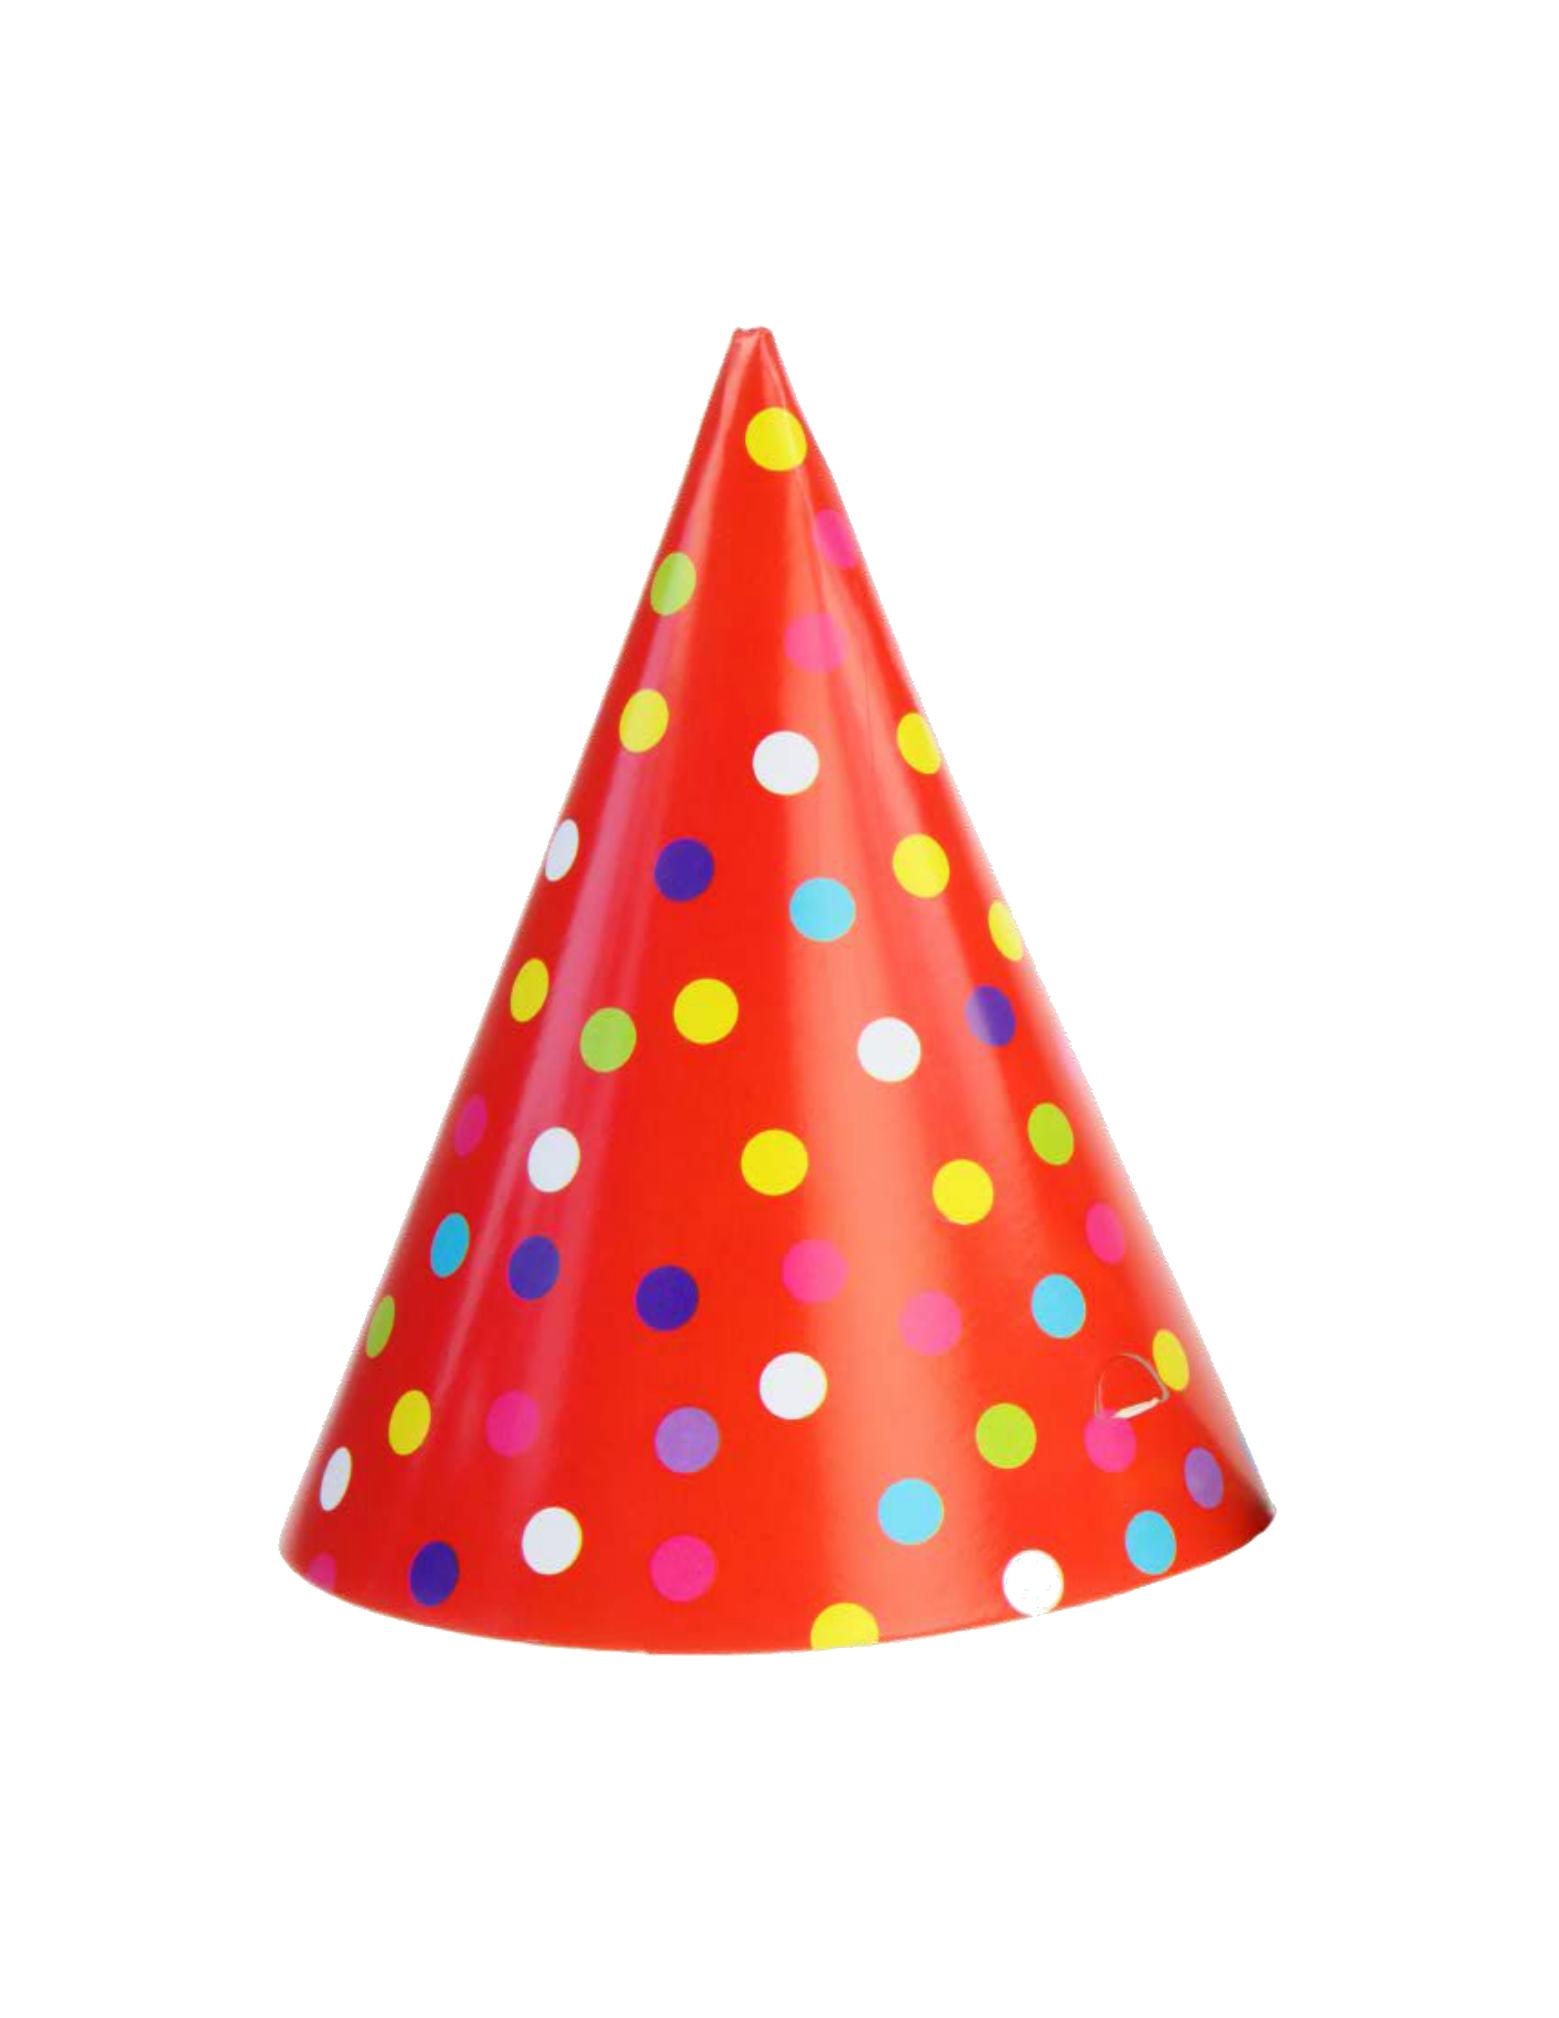 Download Party Hat File HQ PNG Image | FreePNGImg